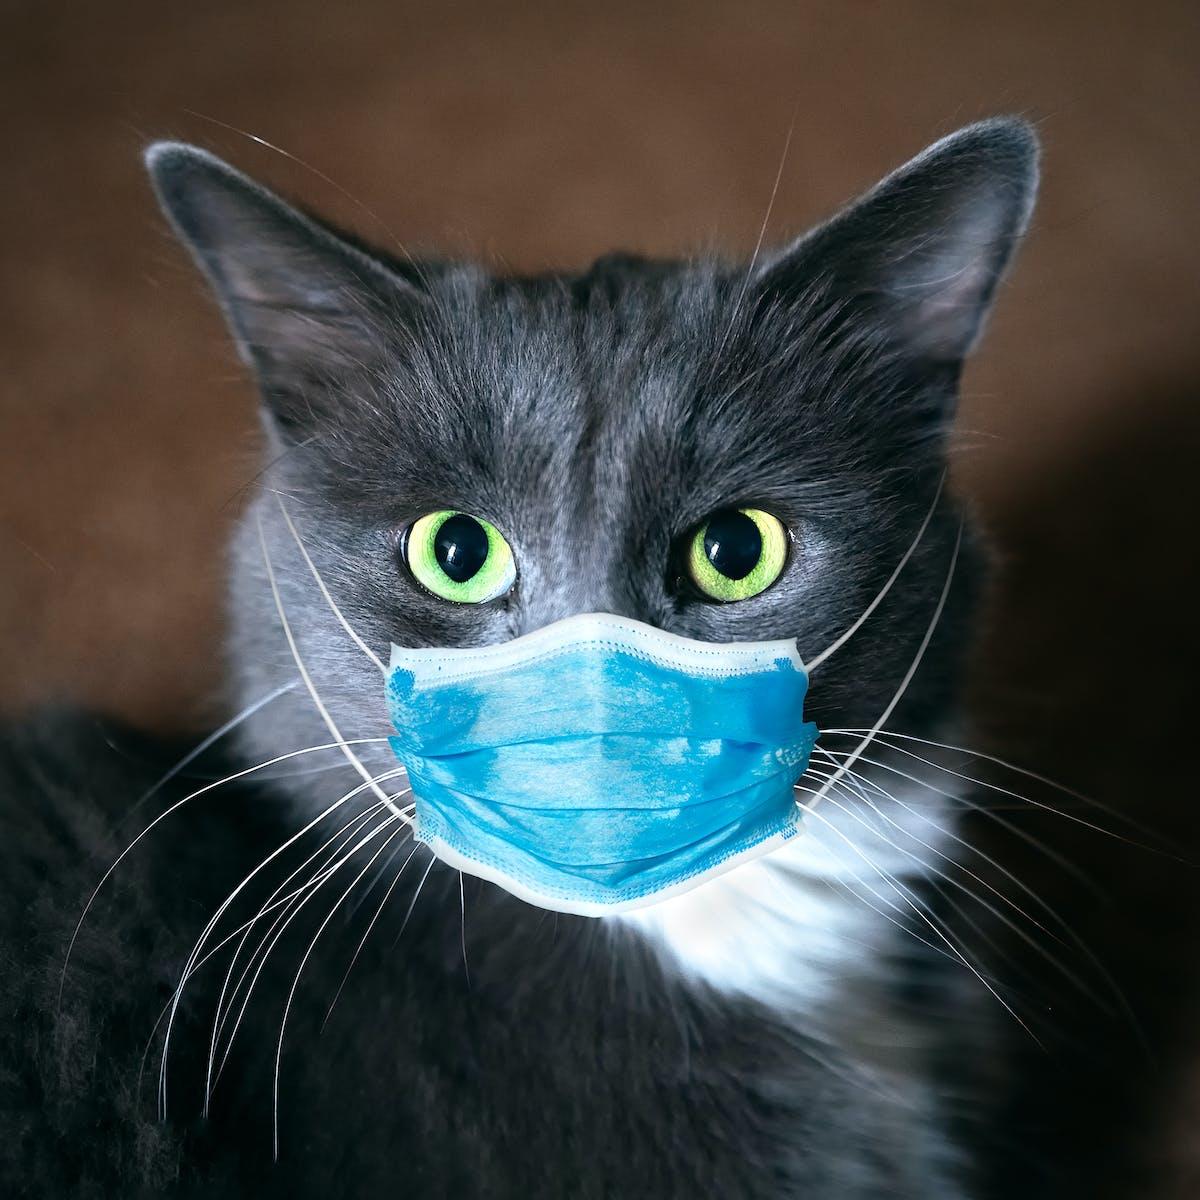 How we found coronavirus in a cat